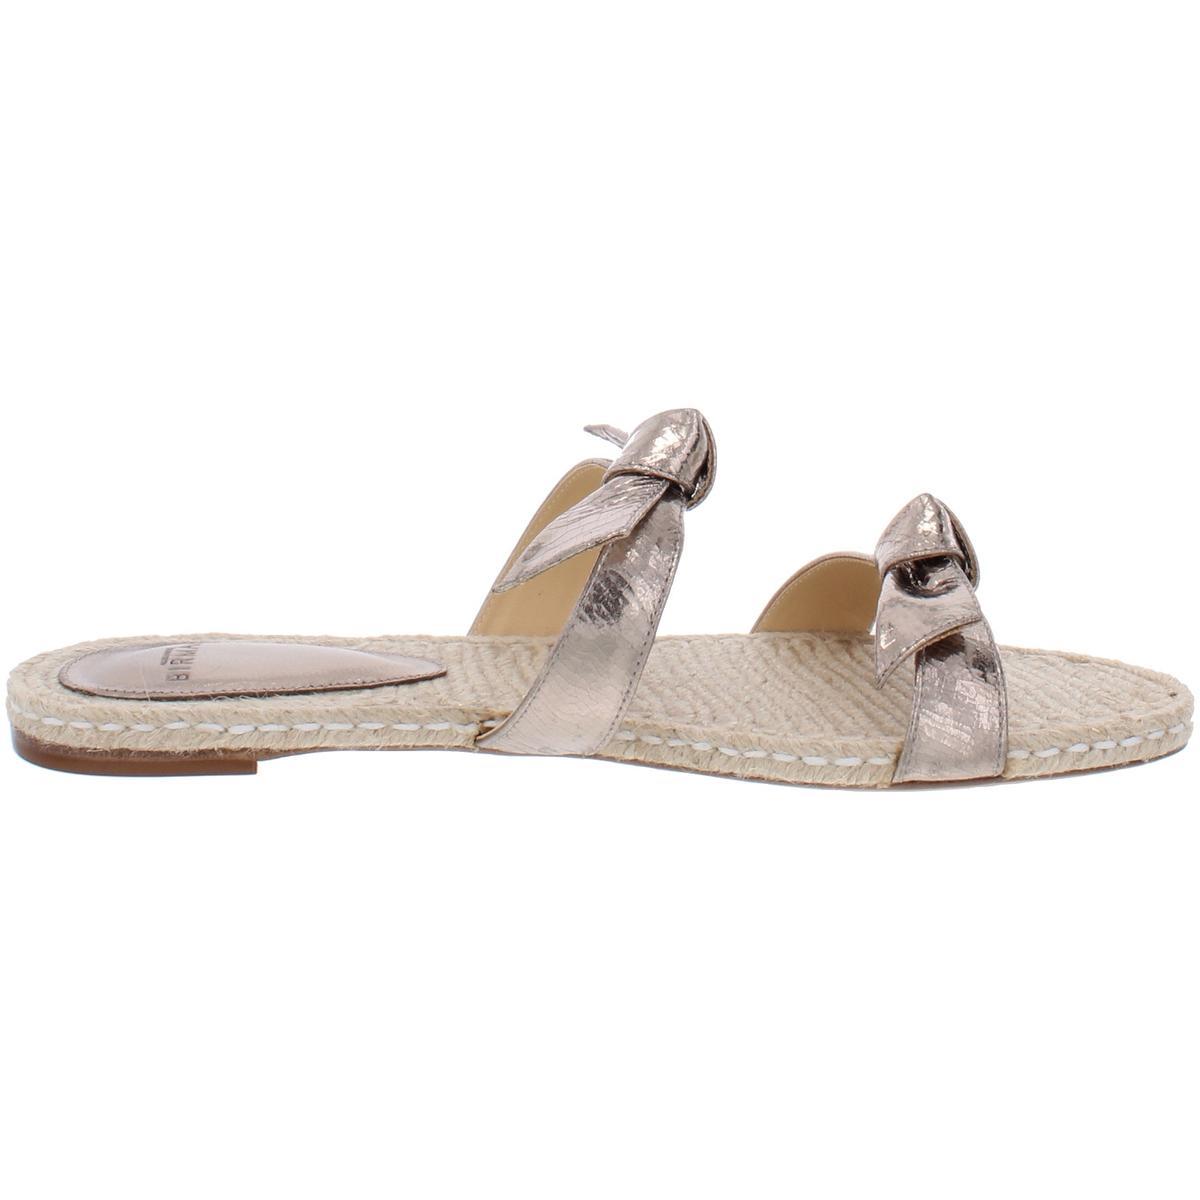 thumbnail 8 - Alexandre Birman Womens Clarita Leather Flats Slide Sandals Shoes BHFO 6244